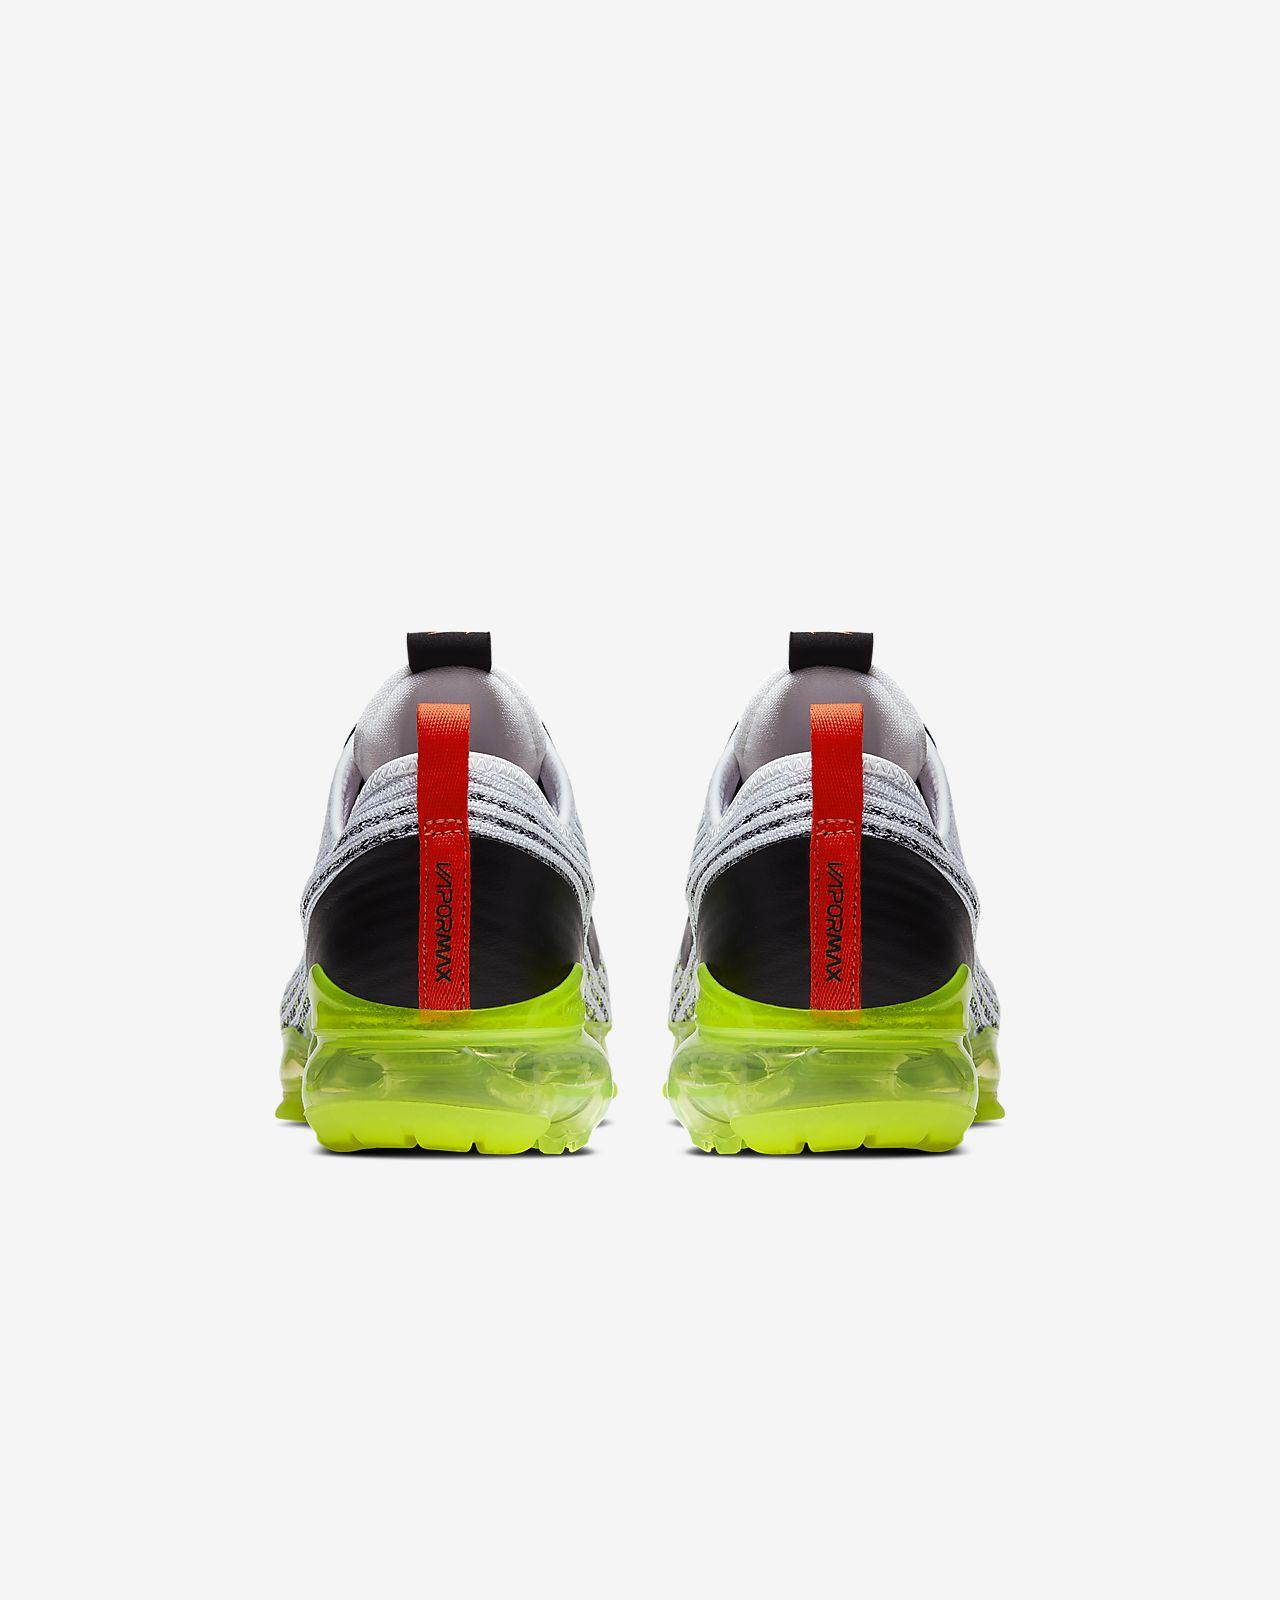 82bf0b365e765f Air Vapormax 3 Ältere Schuh Für Nike Flyknit KinderAt FJK1cl